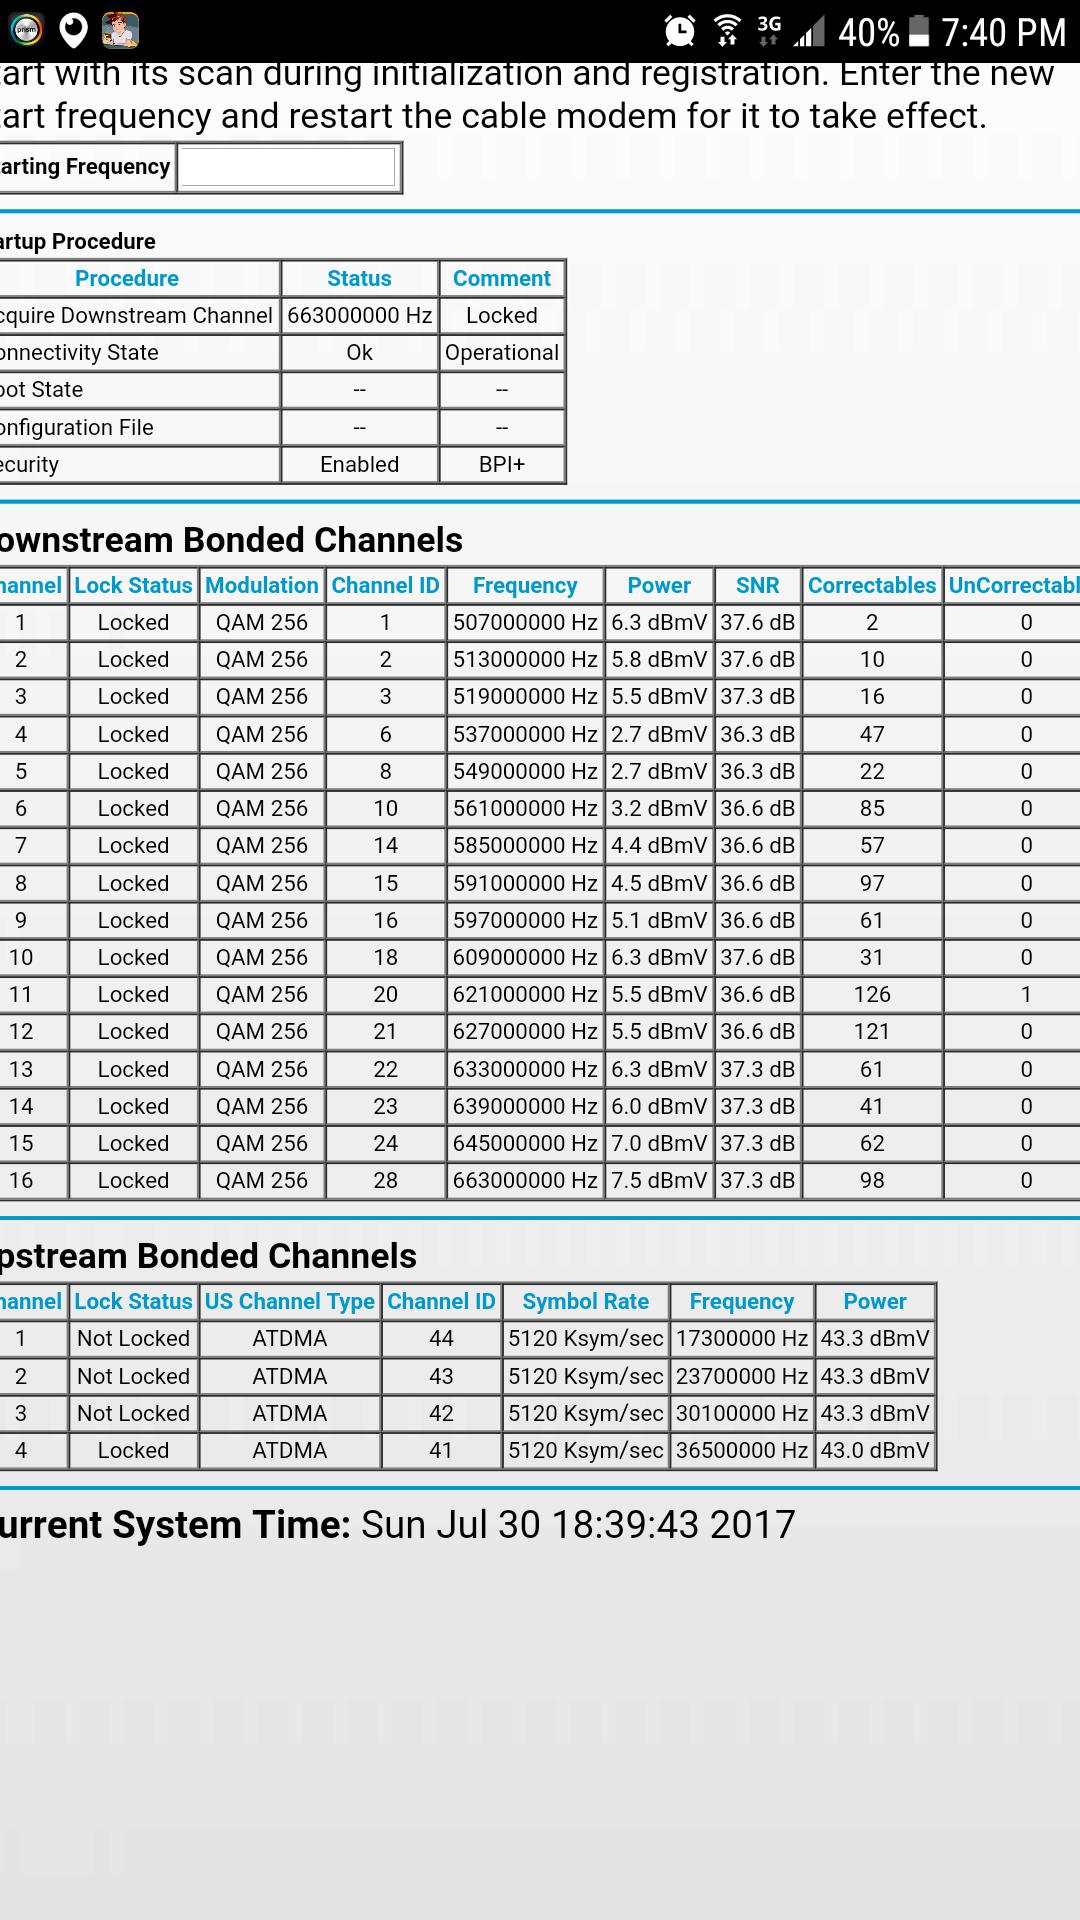 18348i082E21404C4FF440?v=1 Xfinity Cable Modem Wiring Diagram on 4j58g, rj14 rj11, balanced xlr, cat5e ethernet, rj45 patch, network crossover, android micro usb, hdmi composite rca, cat5 patch, hdmi micro usb, cat5e,